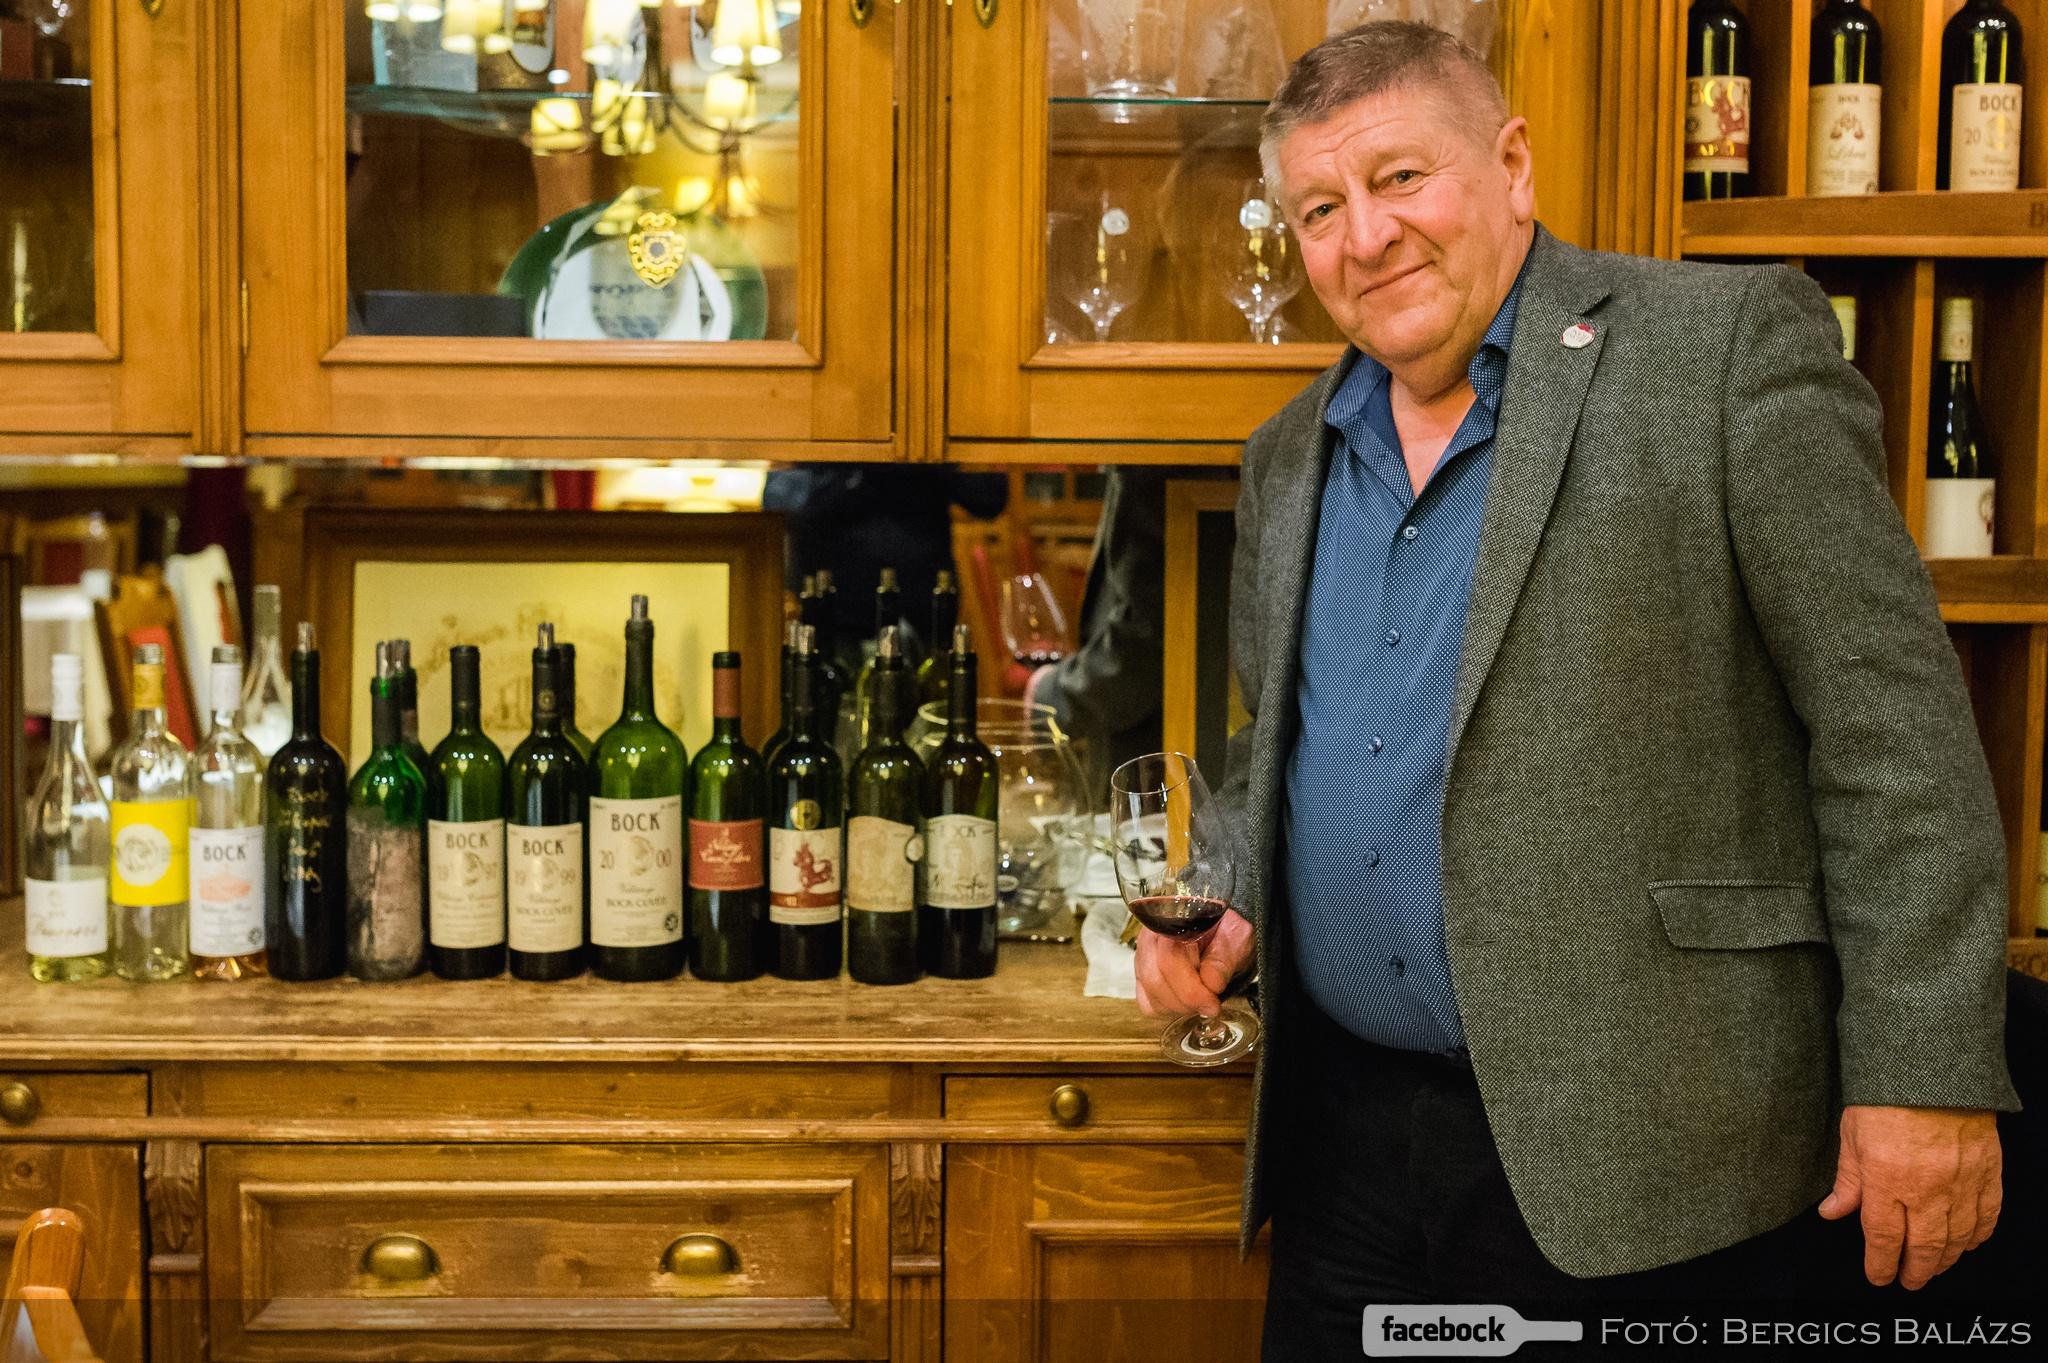 Megkóstoltuk Bock József kedvenc borait